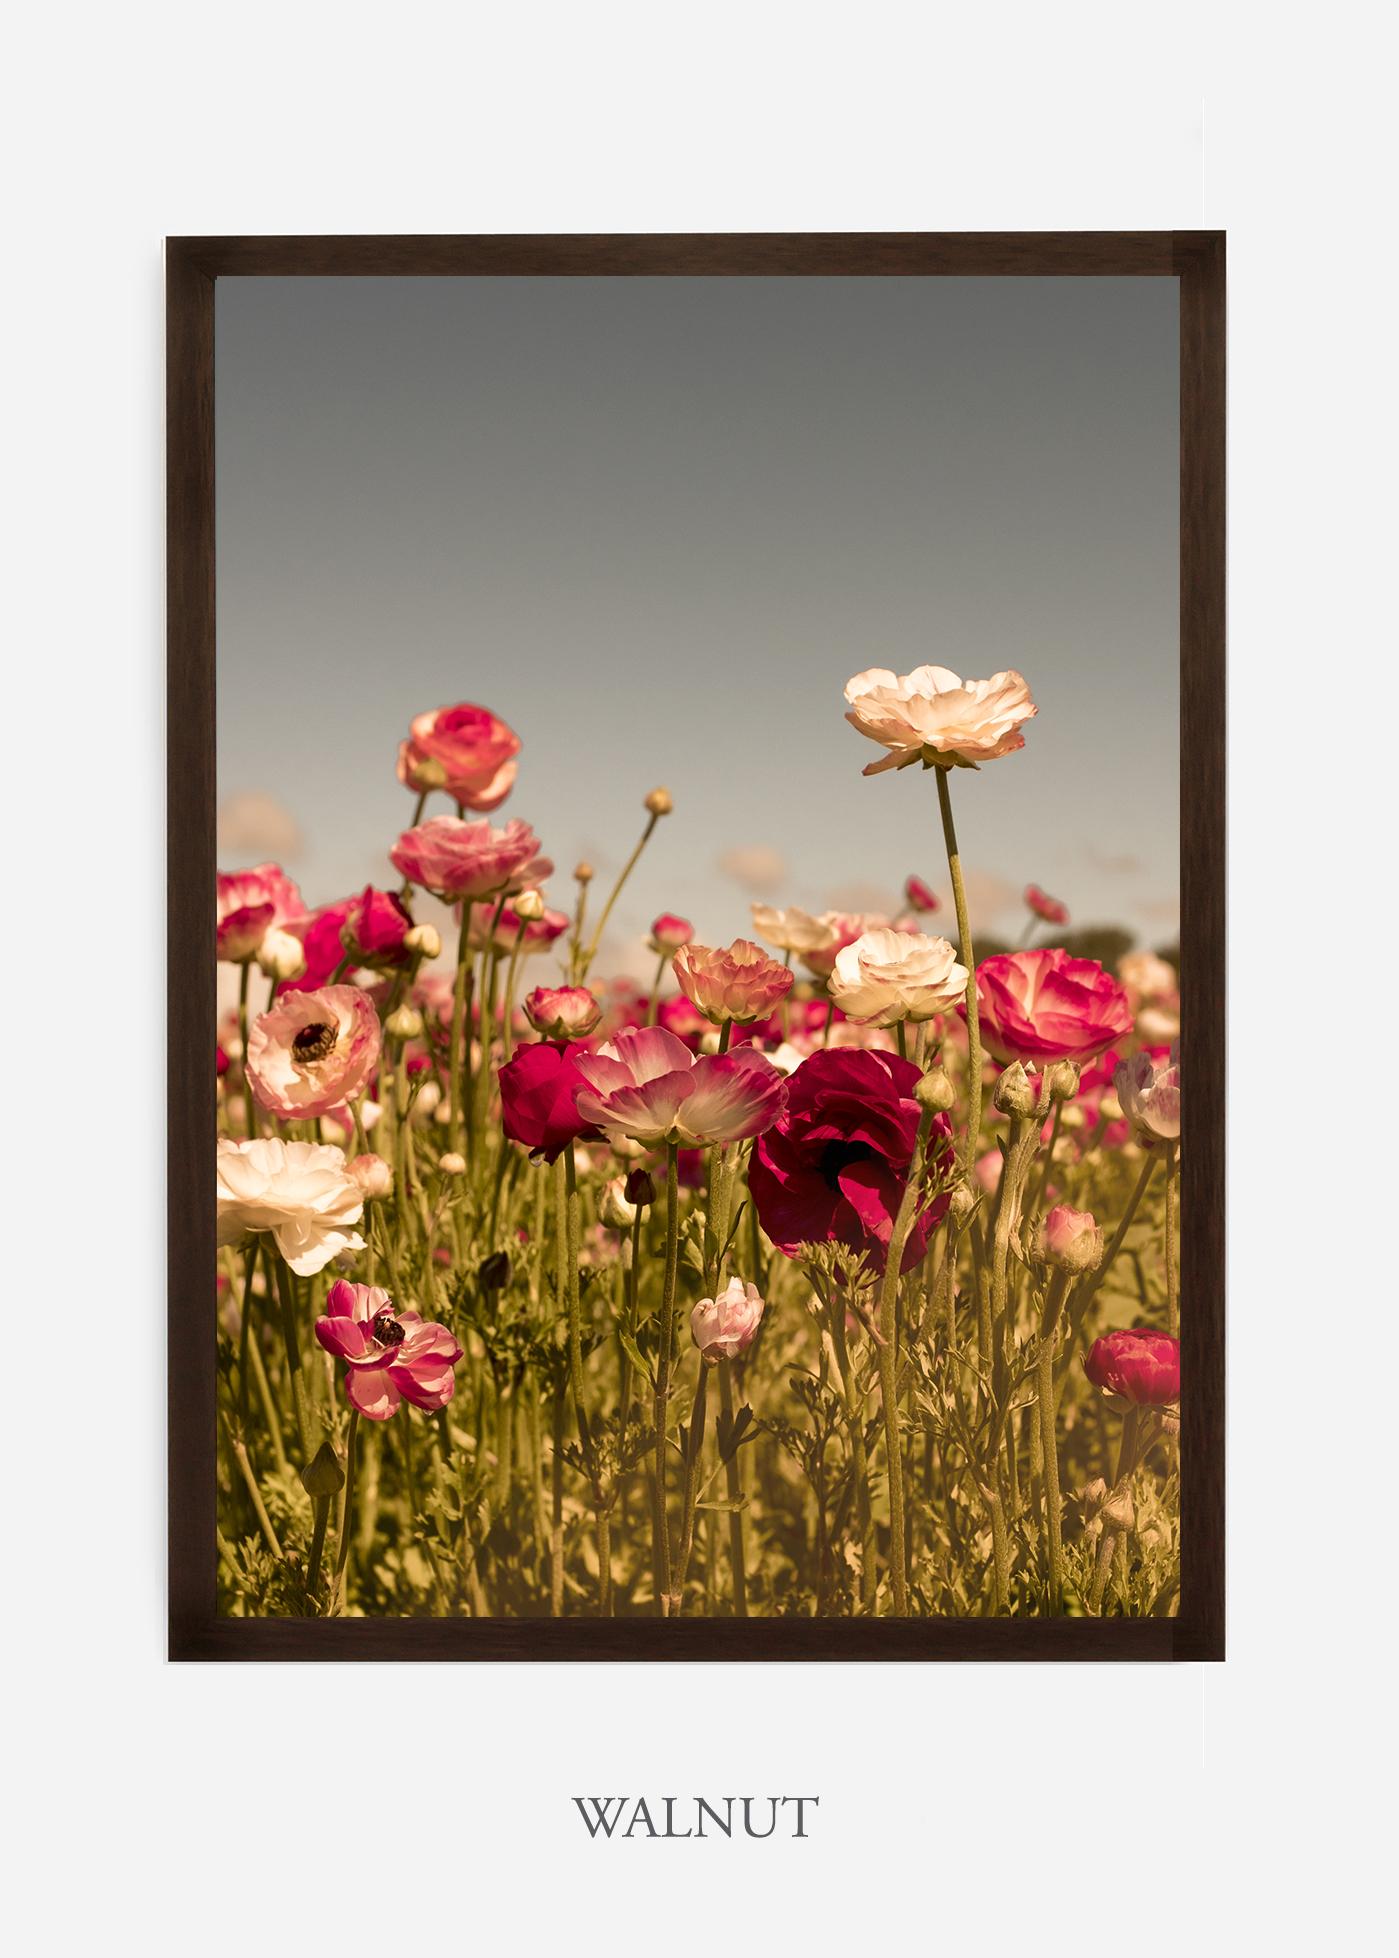 wilder-california-Floral-No.3-walnut-frame-no-mat-interior-design-botanical-print-art-floral-art.jpg